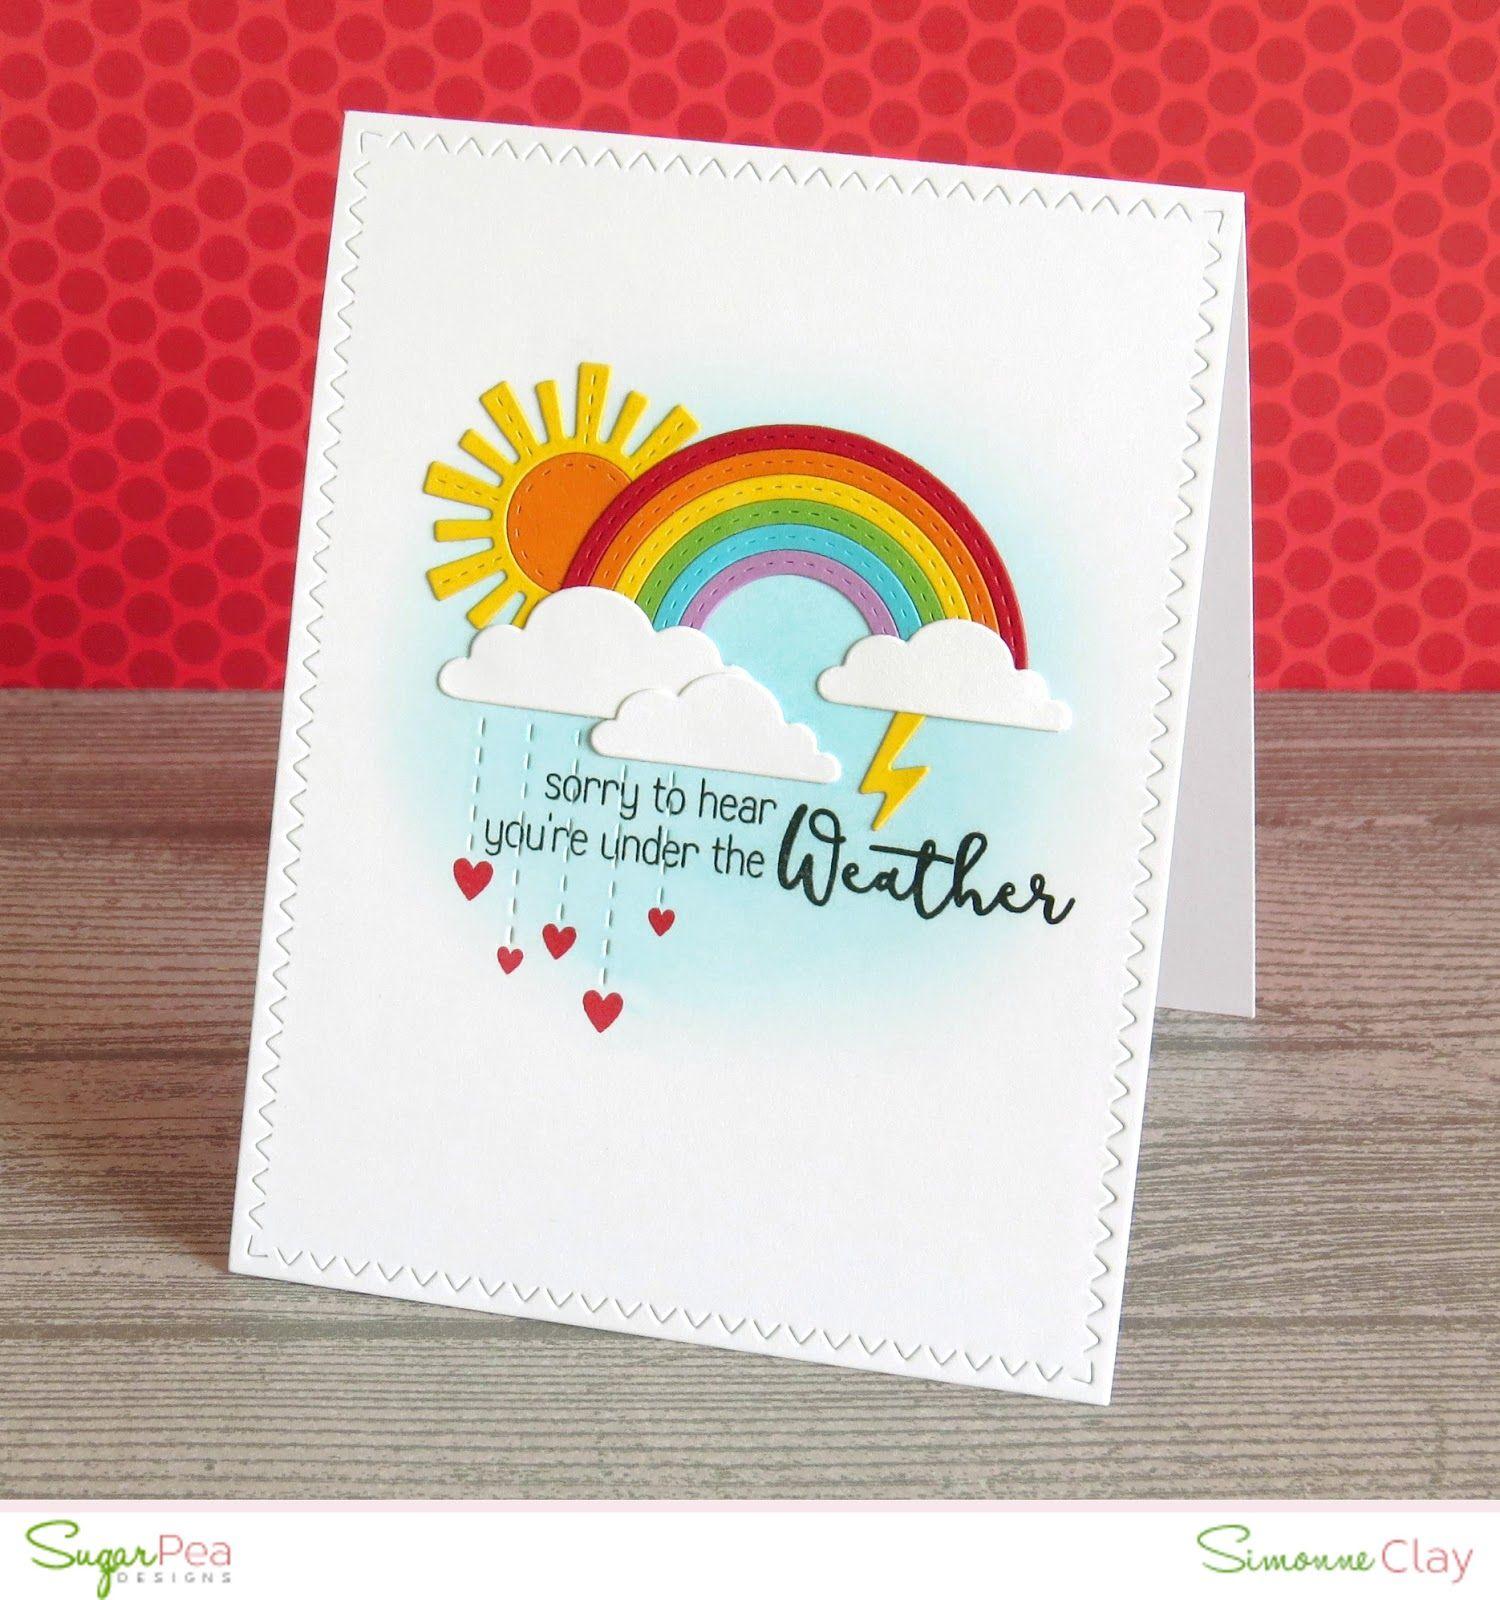 Semseeus sparkly scribblings card display ideas pinterest